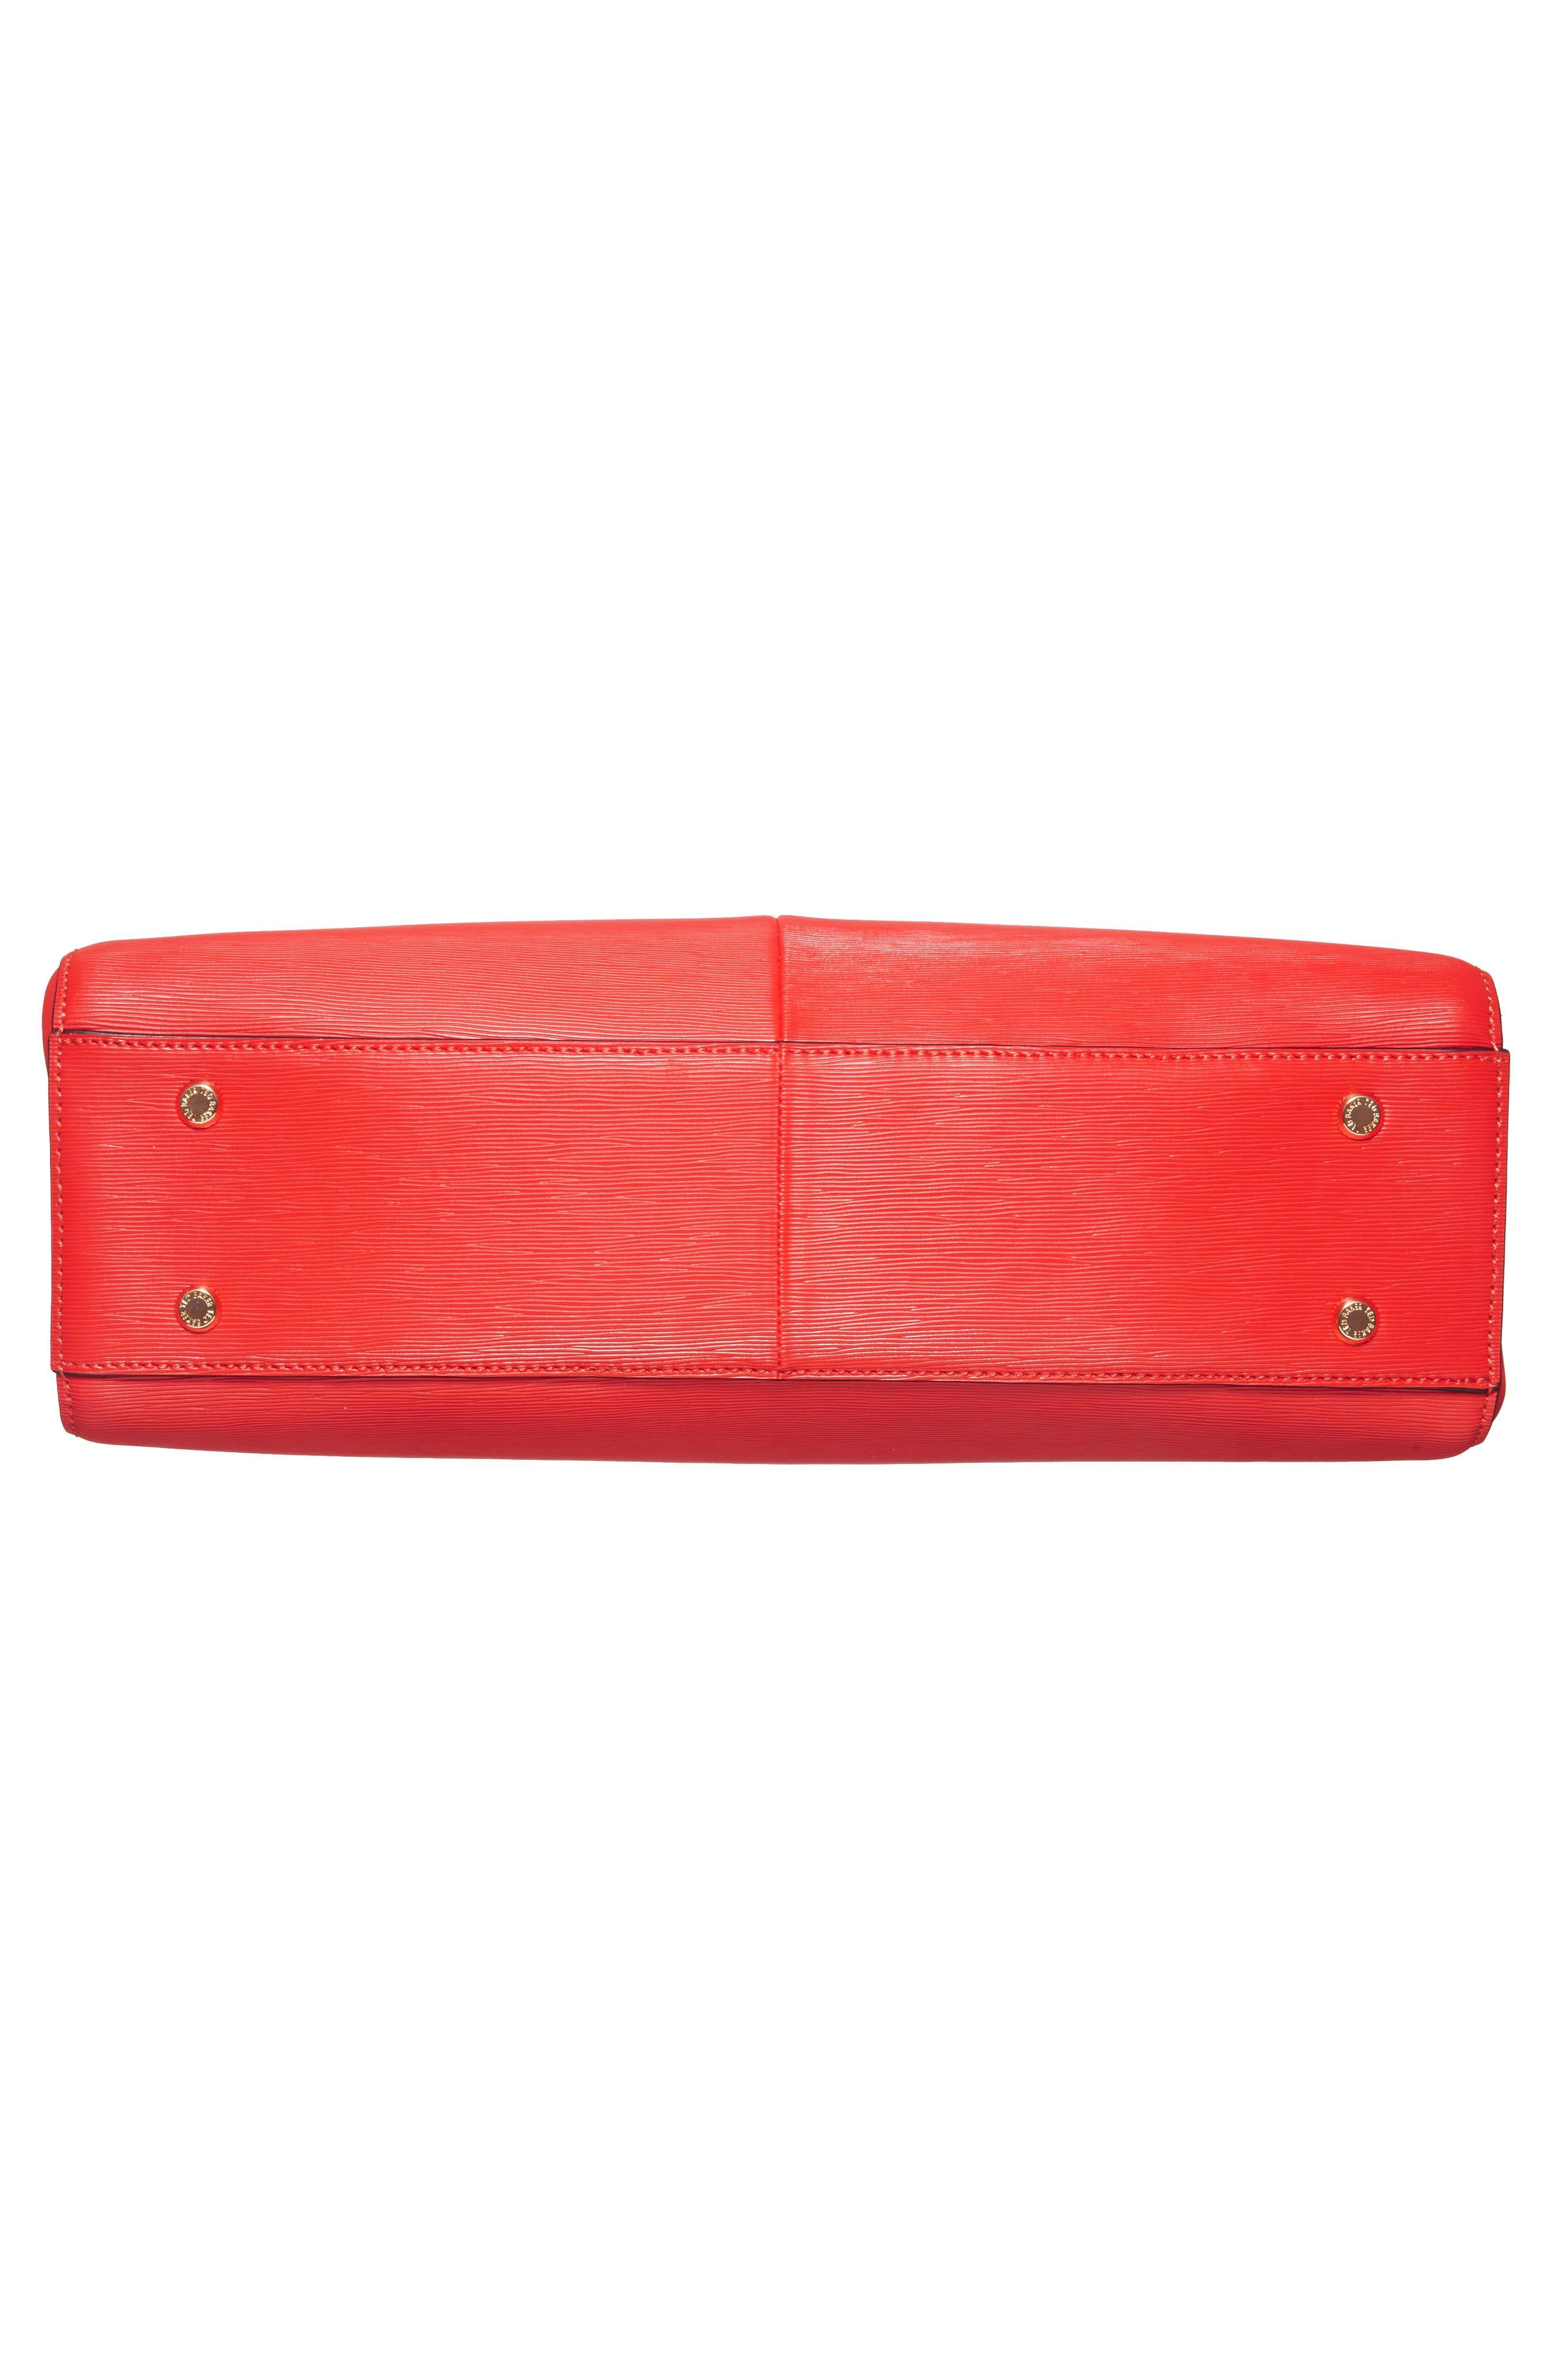 Callaa Bow Leather Shopper,                             Alternate thumbnail 18, color,